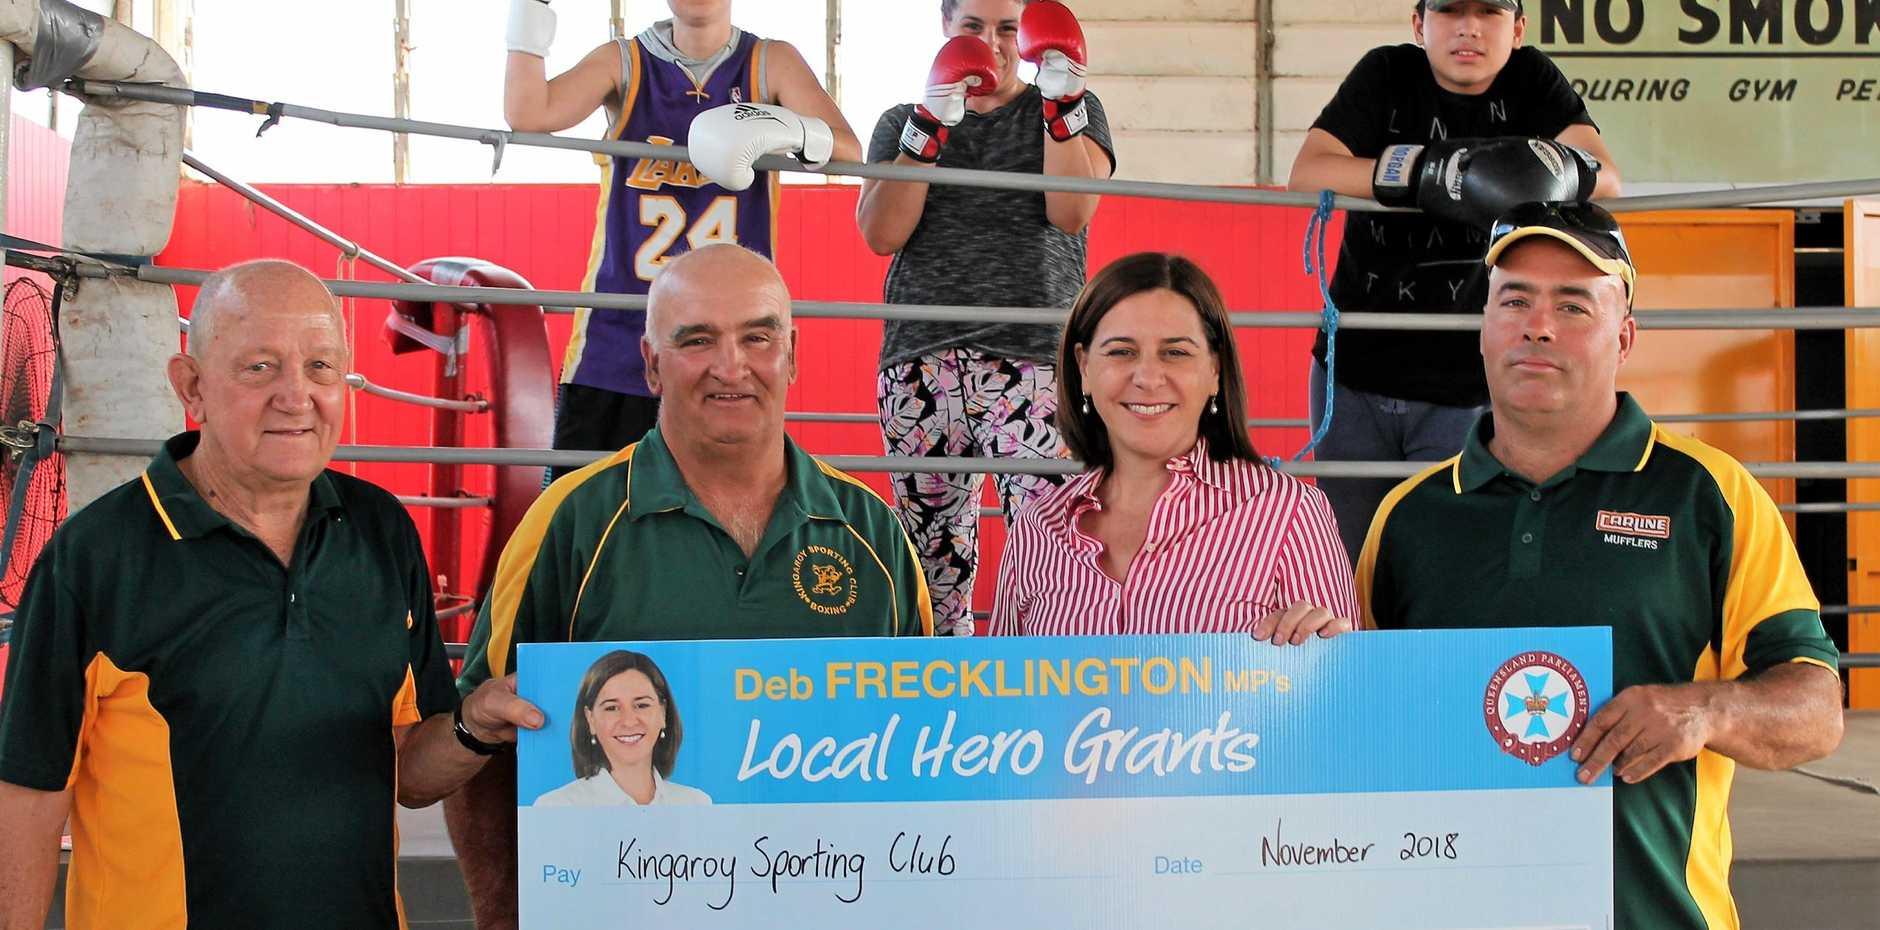 Member for Nanango, Deb Frecklington, congratulated the Kingaroy Sporting Club on their funding success. From l to Lenny Hams, Gary Tessmann, Deb Frecklington and President, Dan.